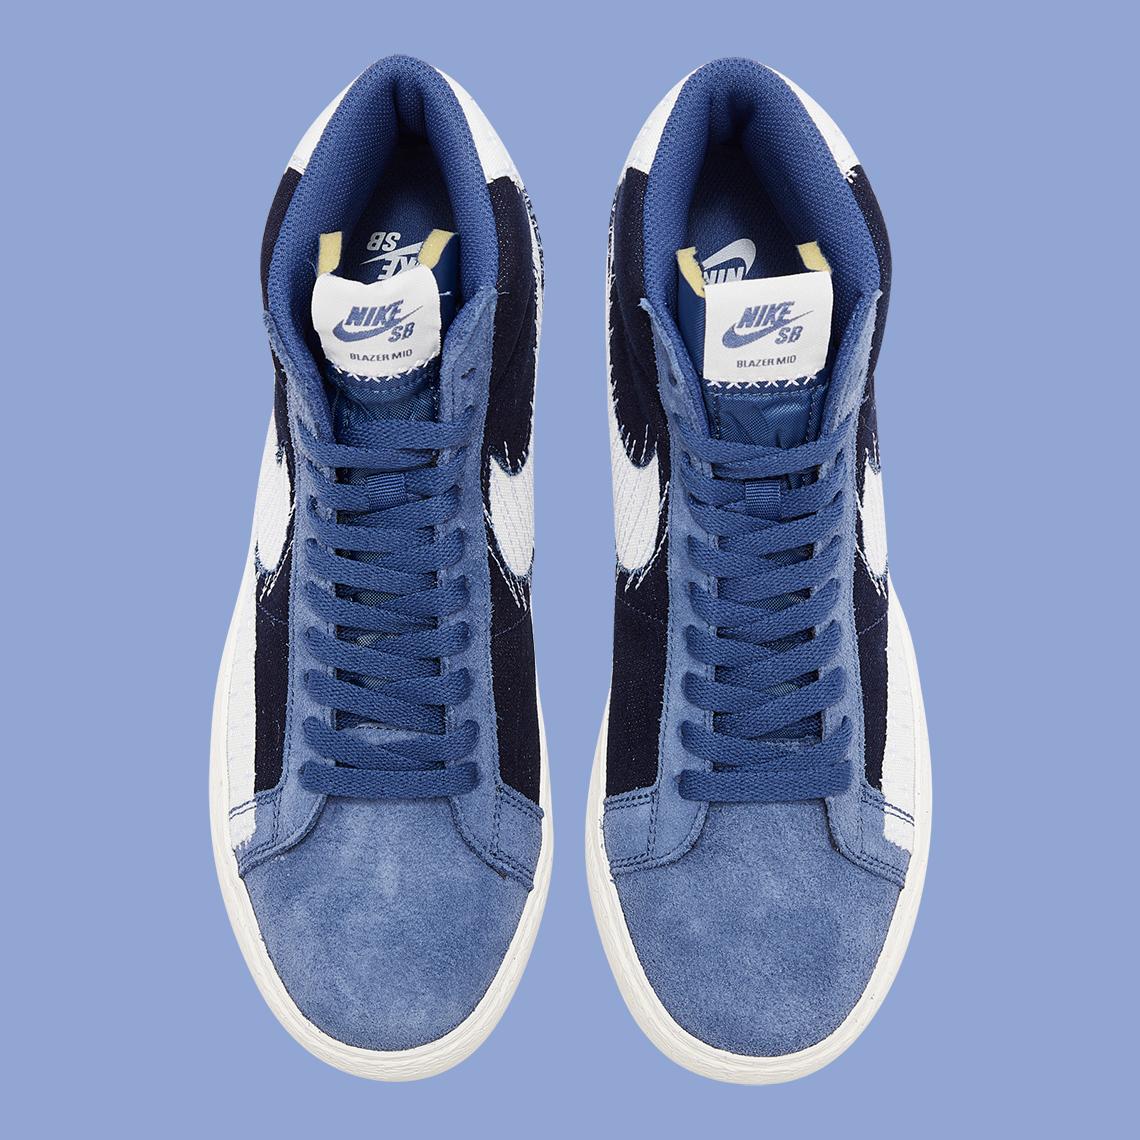 Nike SB Blazer Mid Mystic Navy Sail CT0715-400   SneakerNews.com